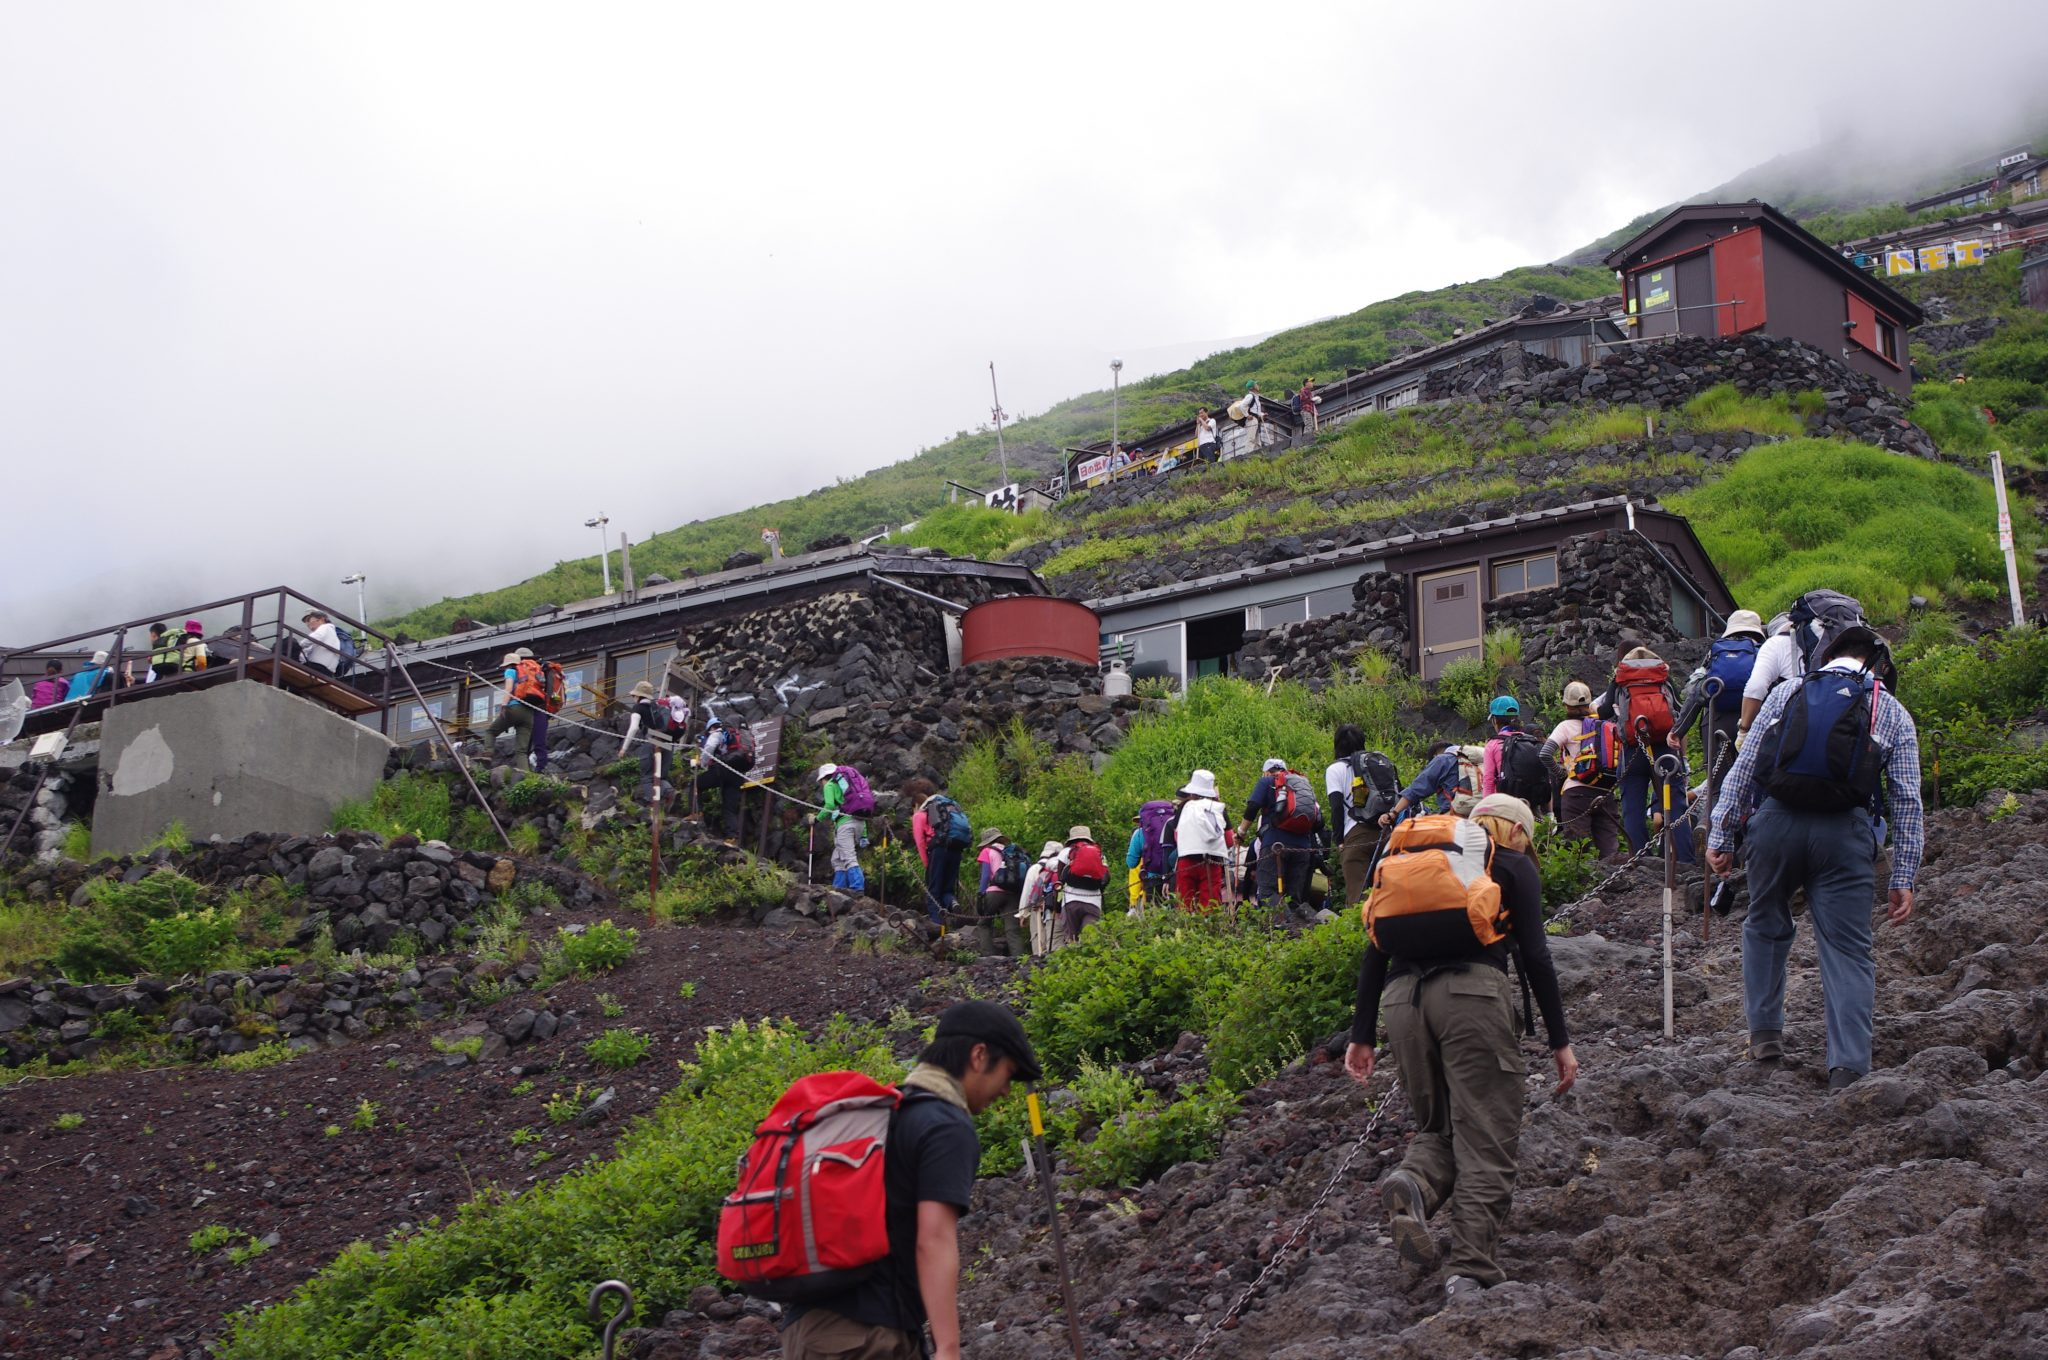 Image_Climbing_Mt_Fuji_CC